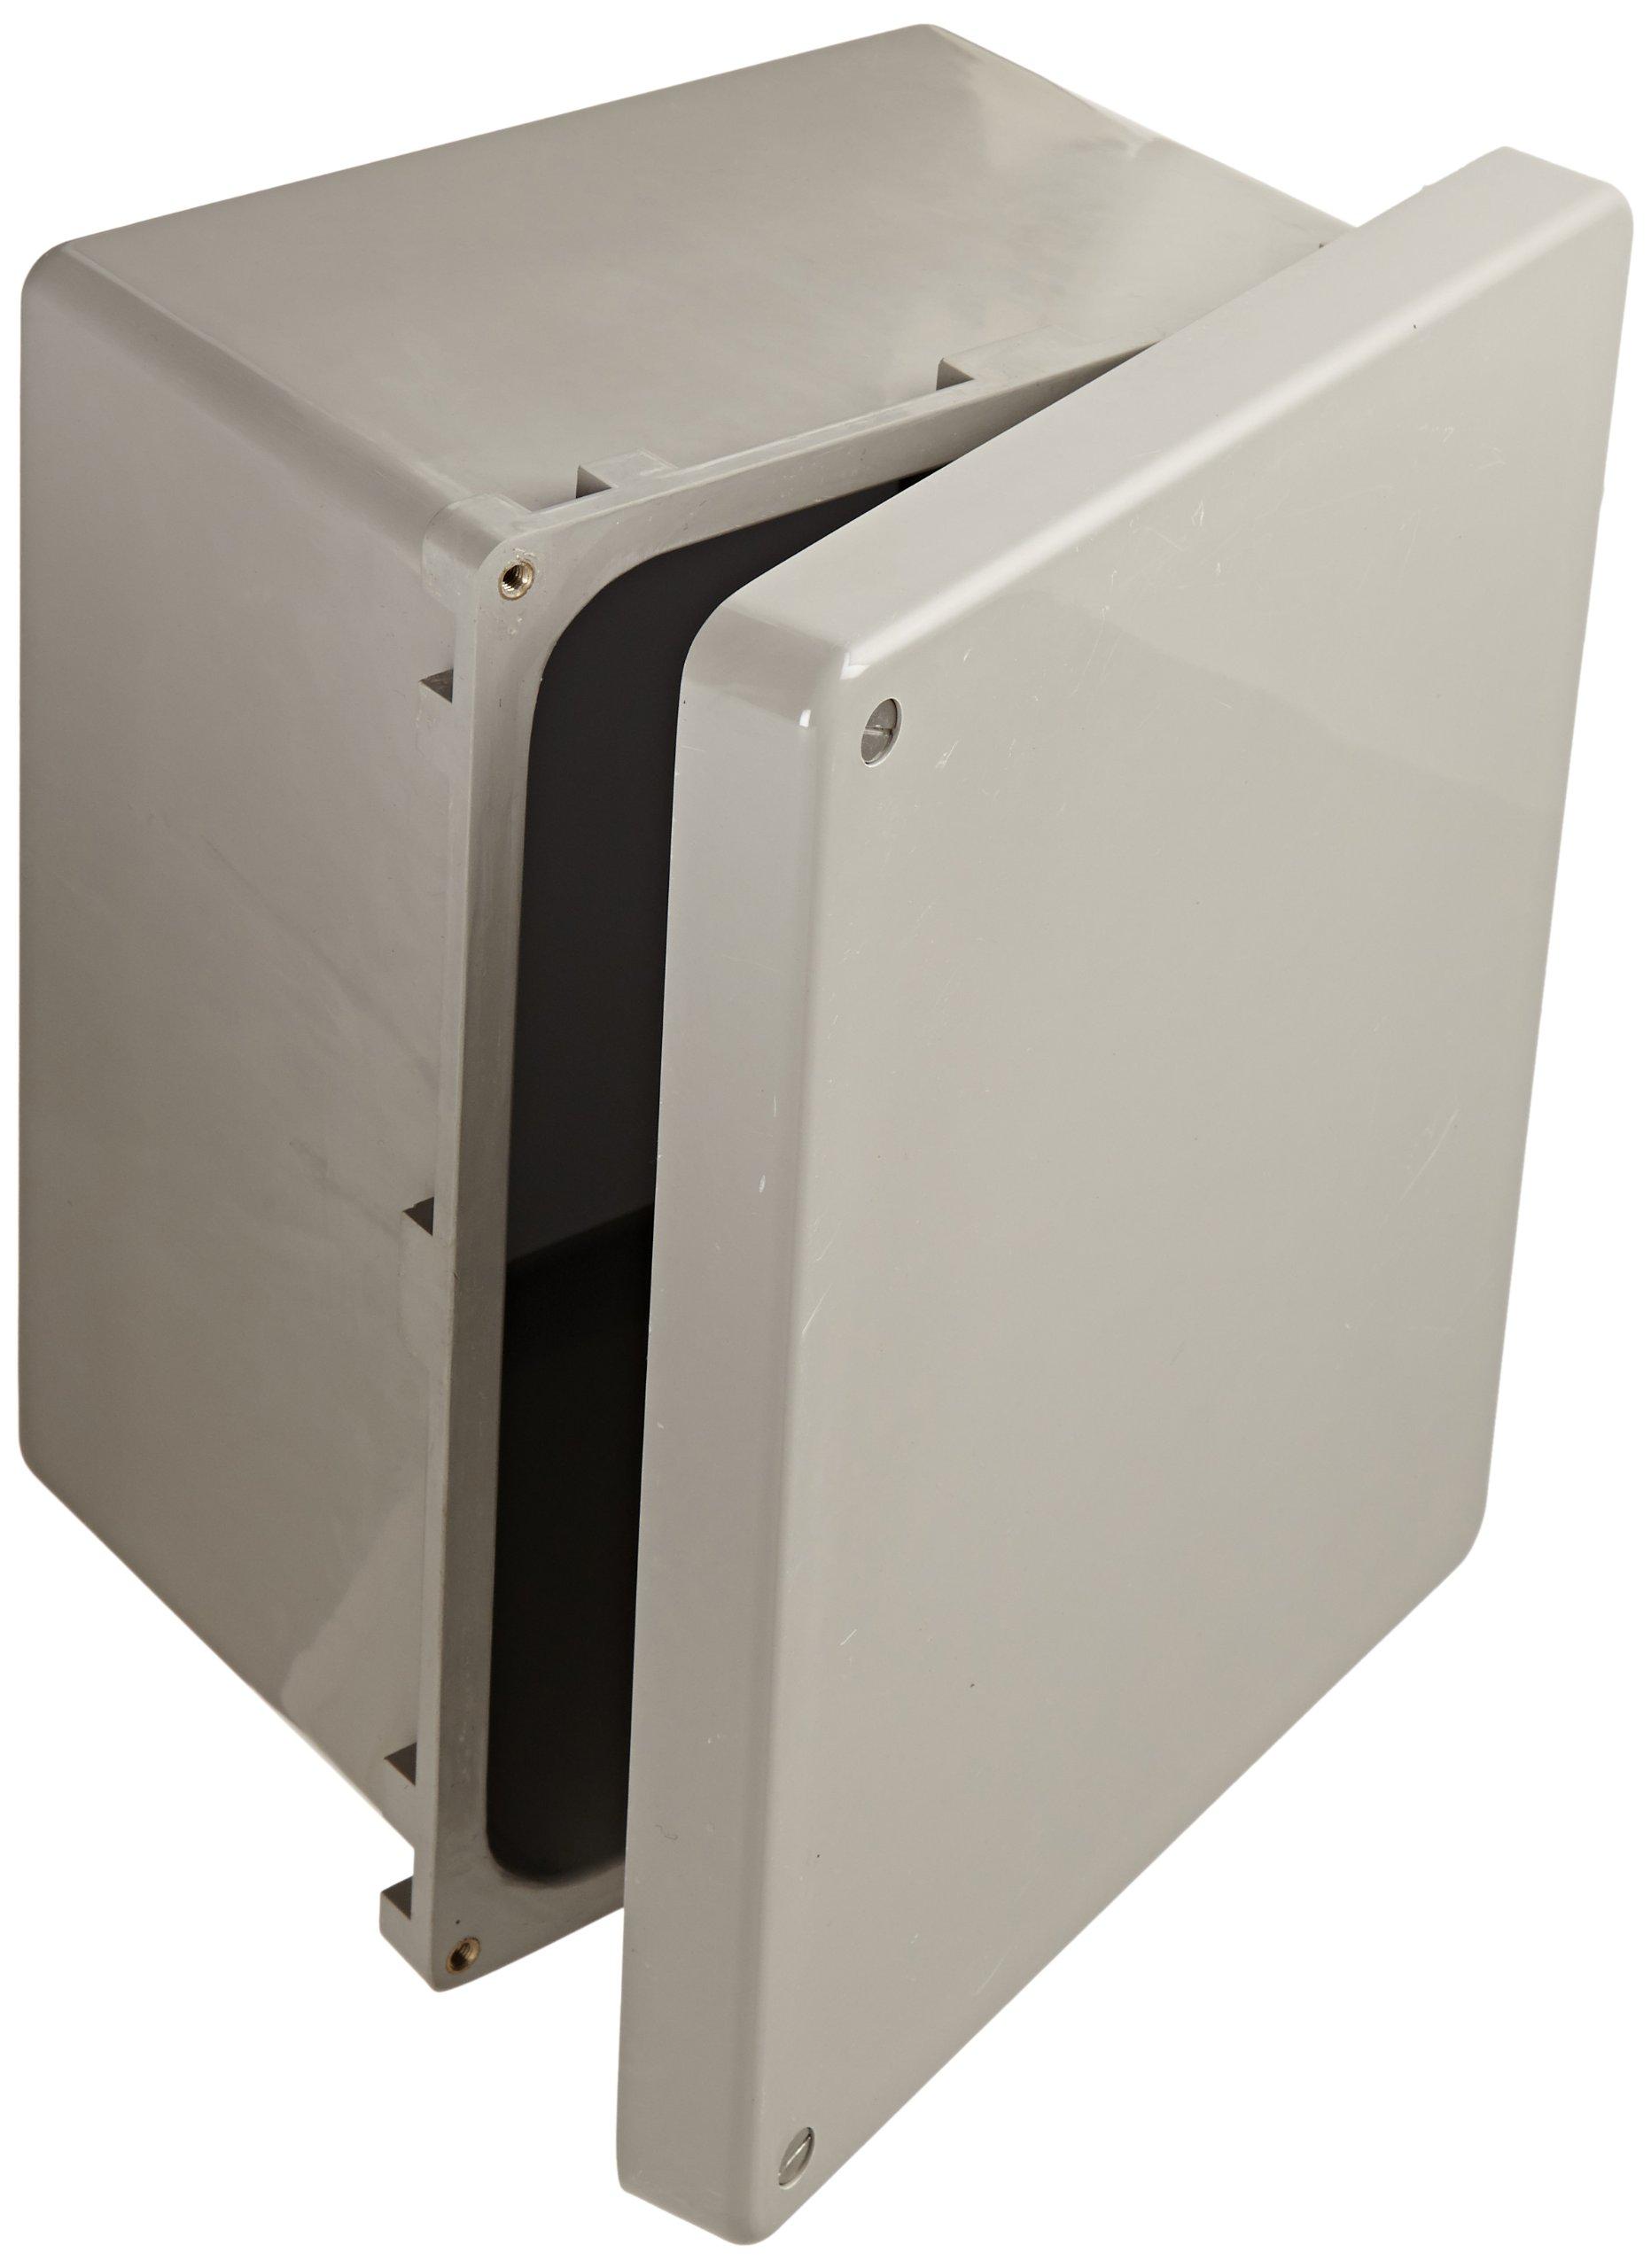 "BUD Industries NF-6612 Fiberglass NEMA Box with Screwed Cover, 9-57/64"" Width x 11-49/64"" Height x 6-51/64"" Depth, Light Gray Finish"